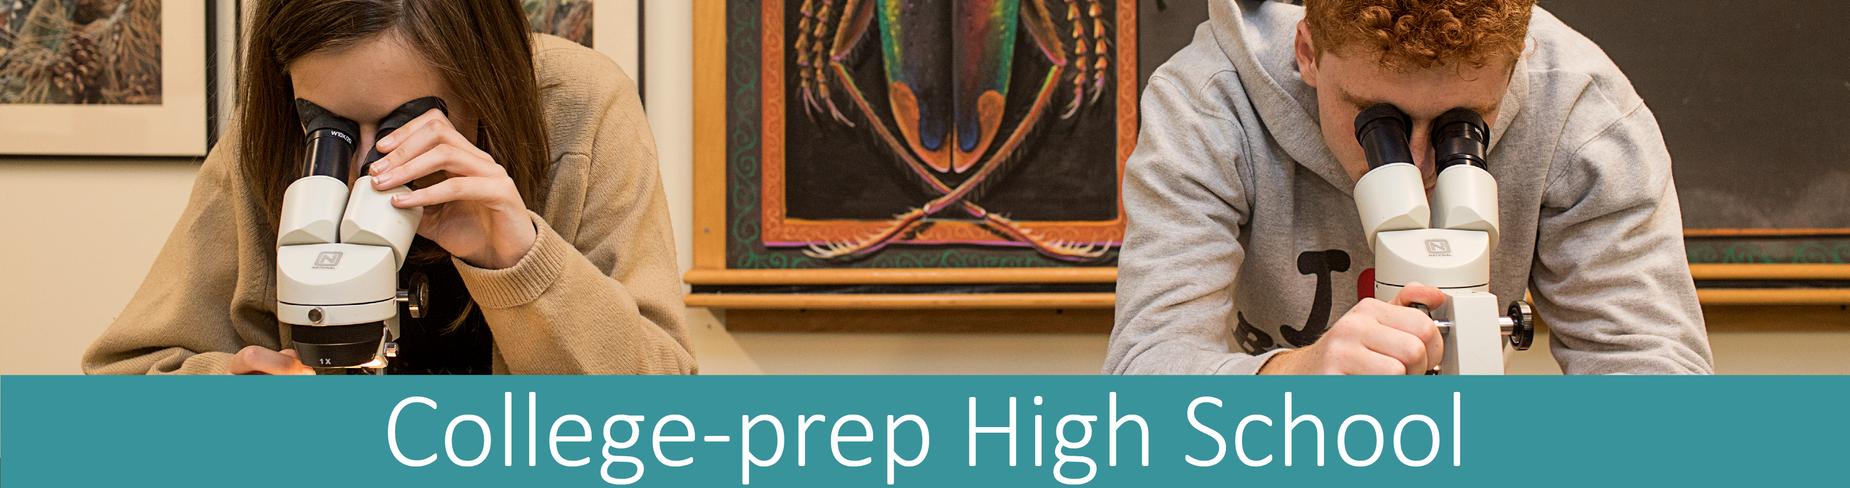 College-prep High School